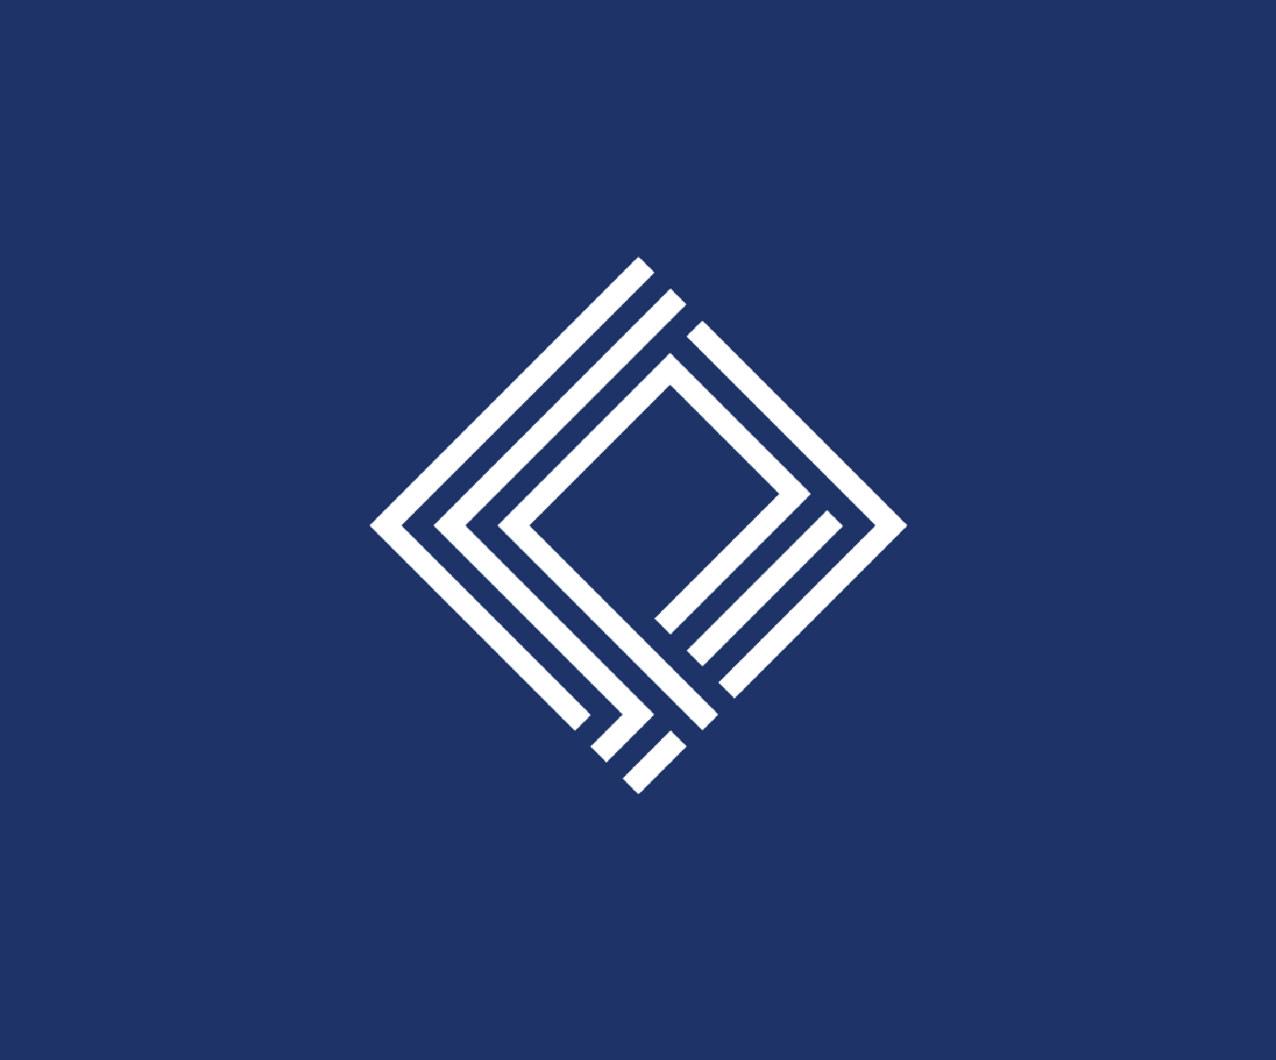 OSP brand icon design